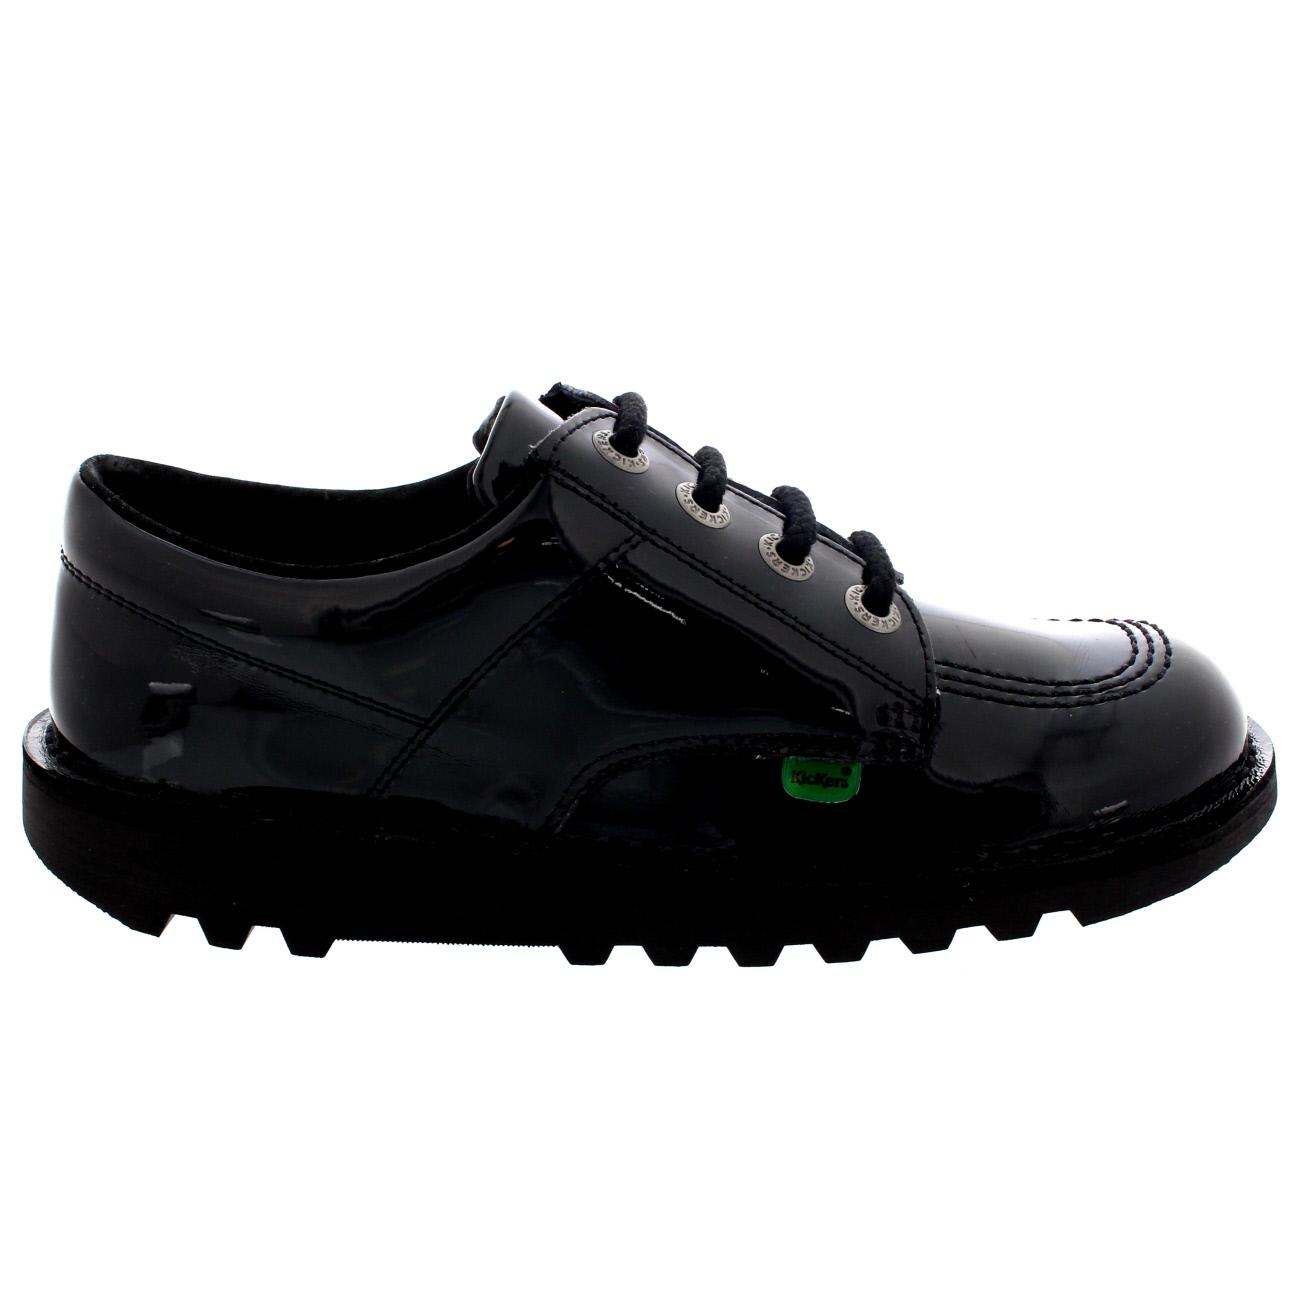 635b0bcbbb Details about Ladies Kickers Kick Lo Core Patent Casual Smart Lace Up Black  Shoes All Sizes